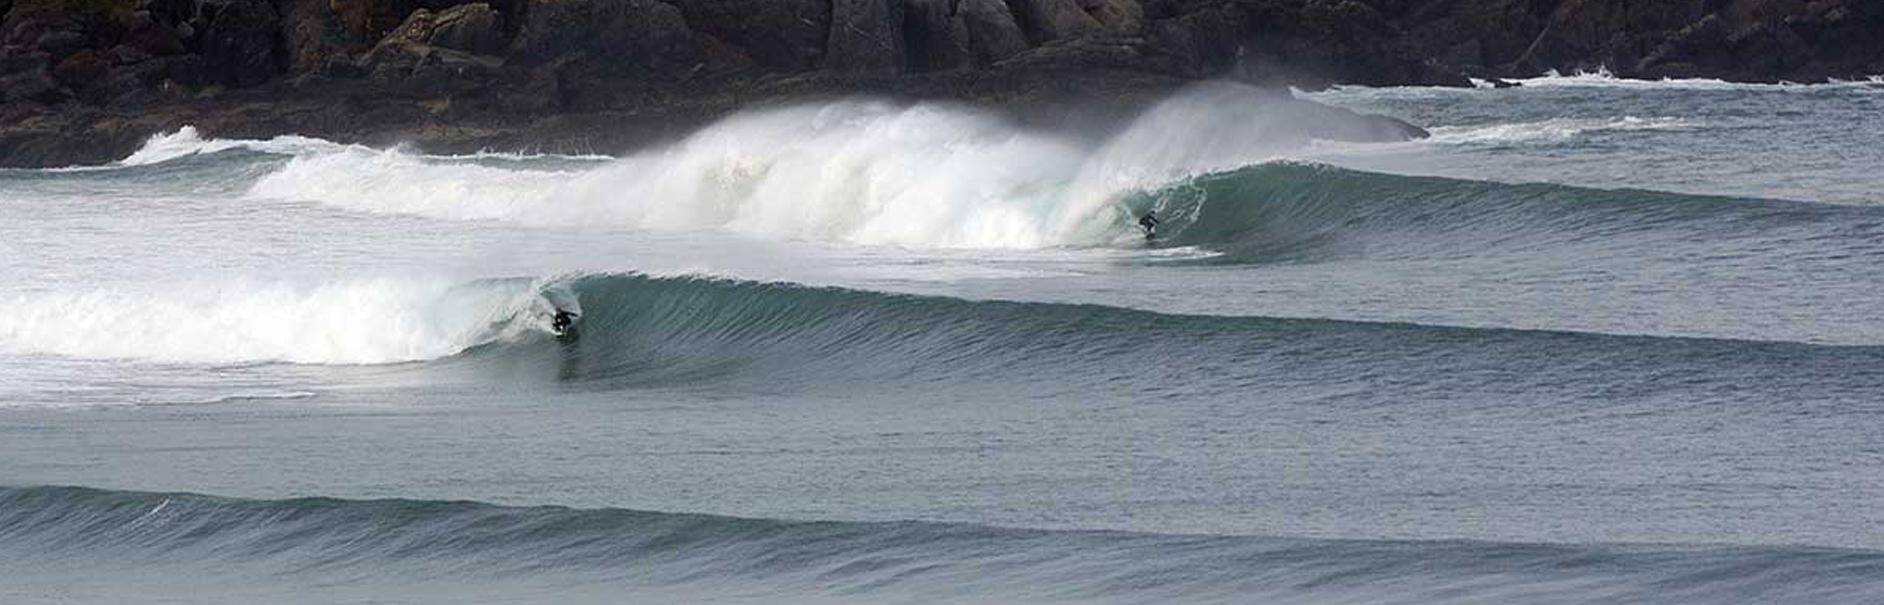 ruta-norte-surf